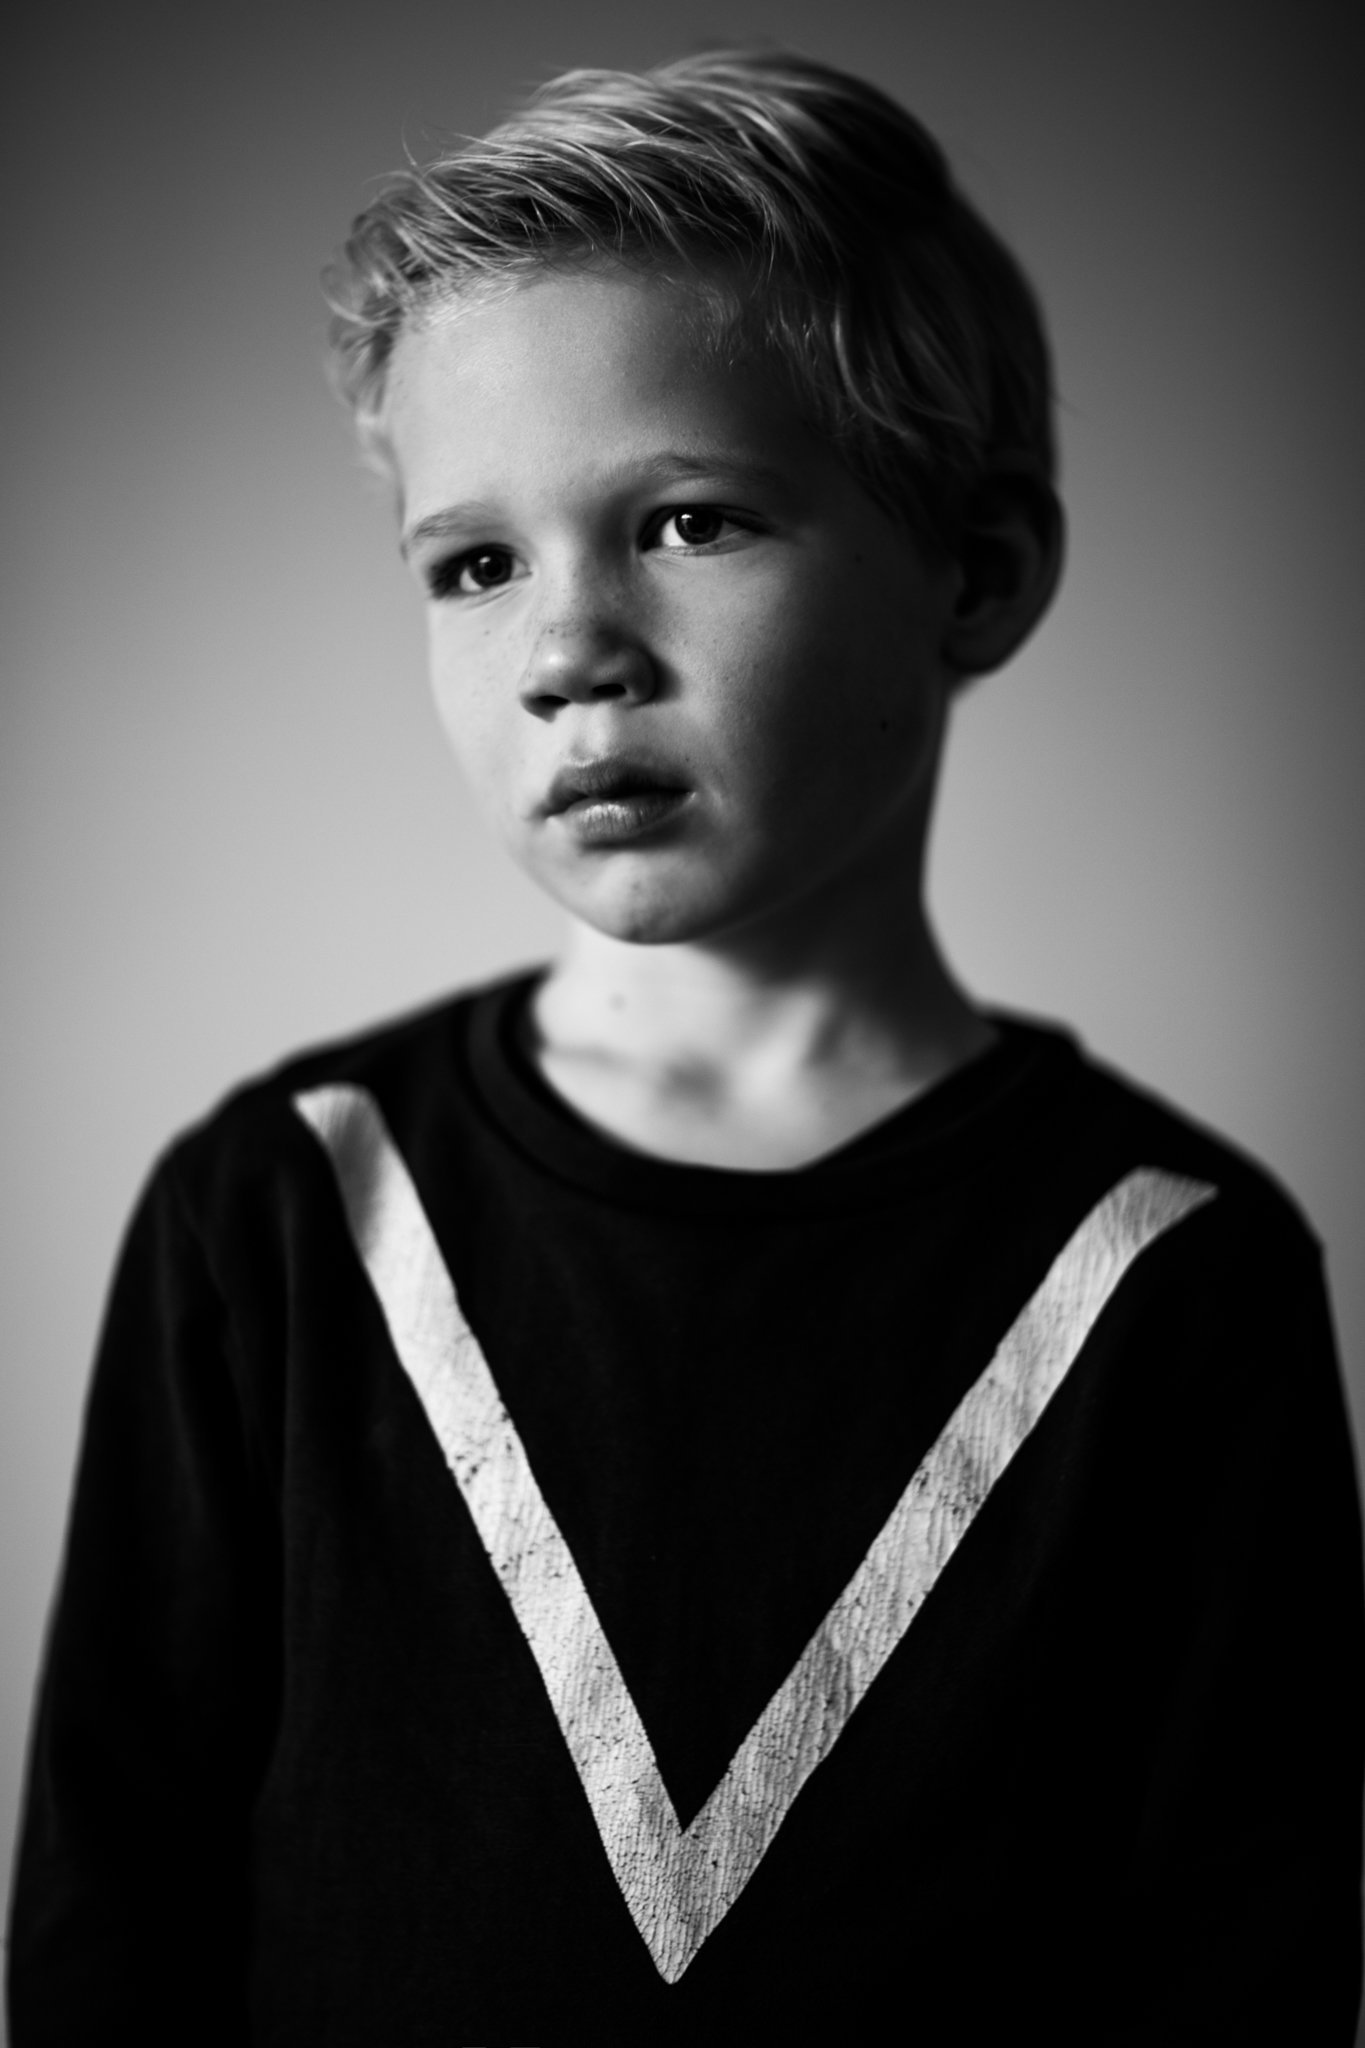 portret_03.jpg